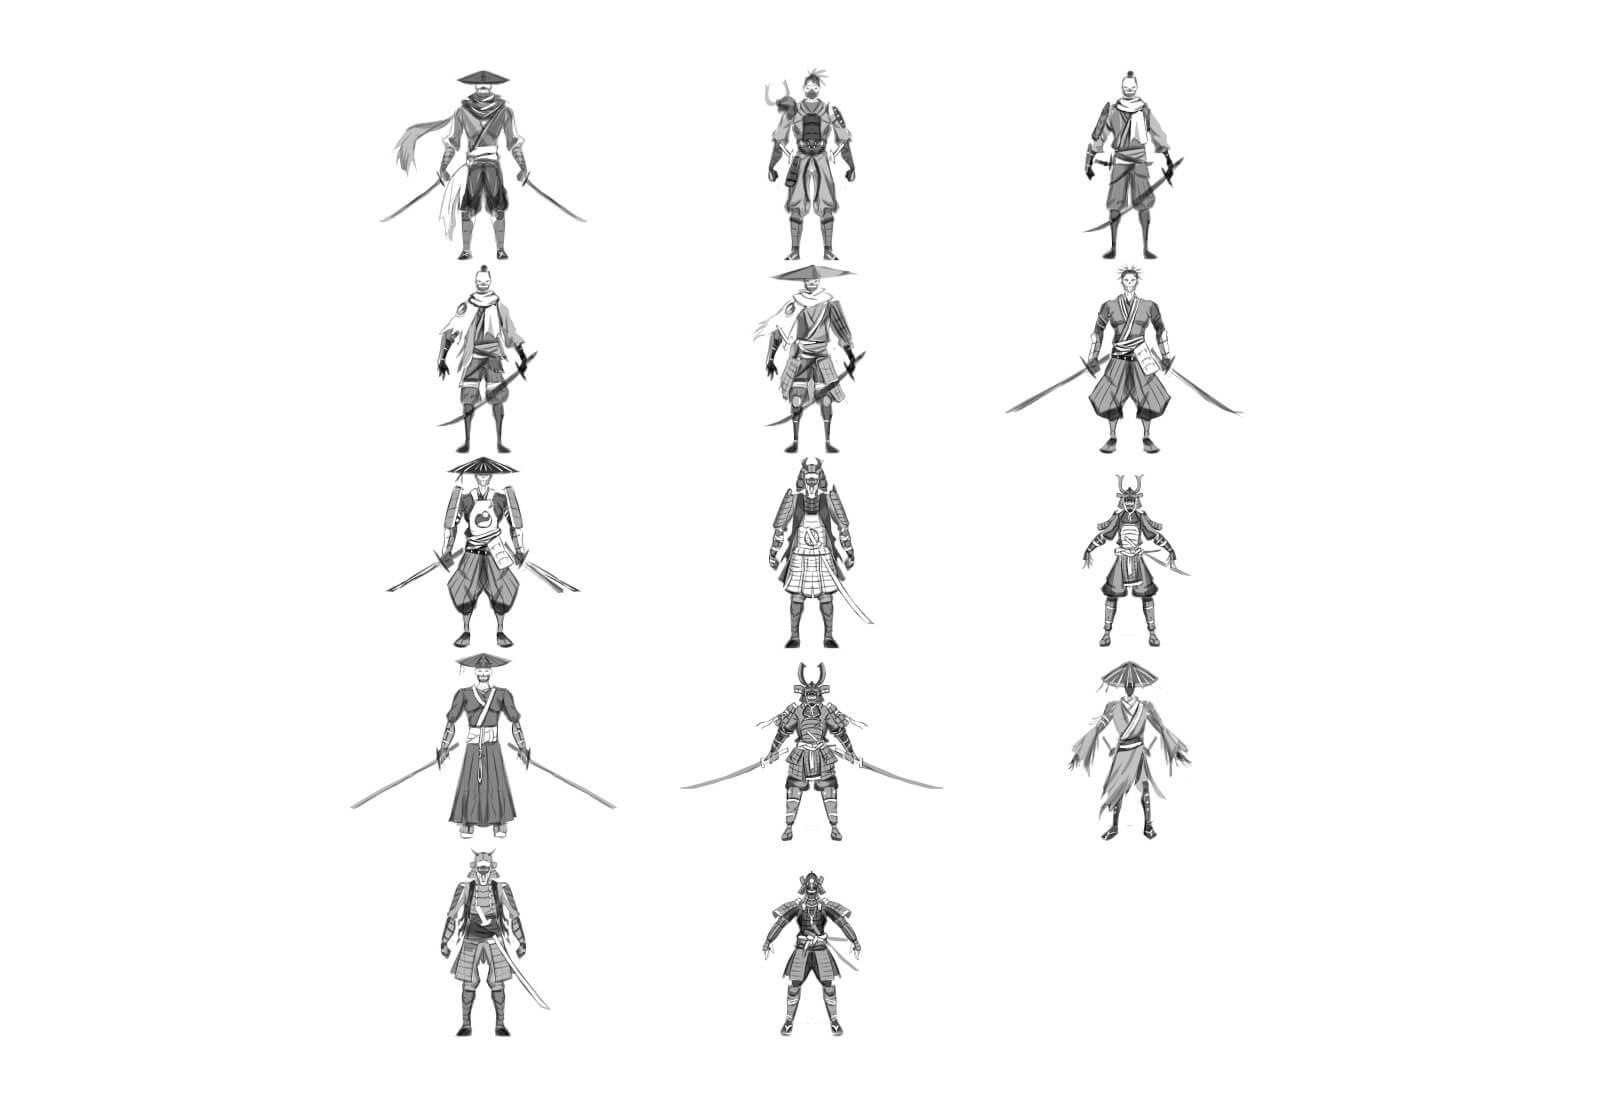 Samurai character sketches